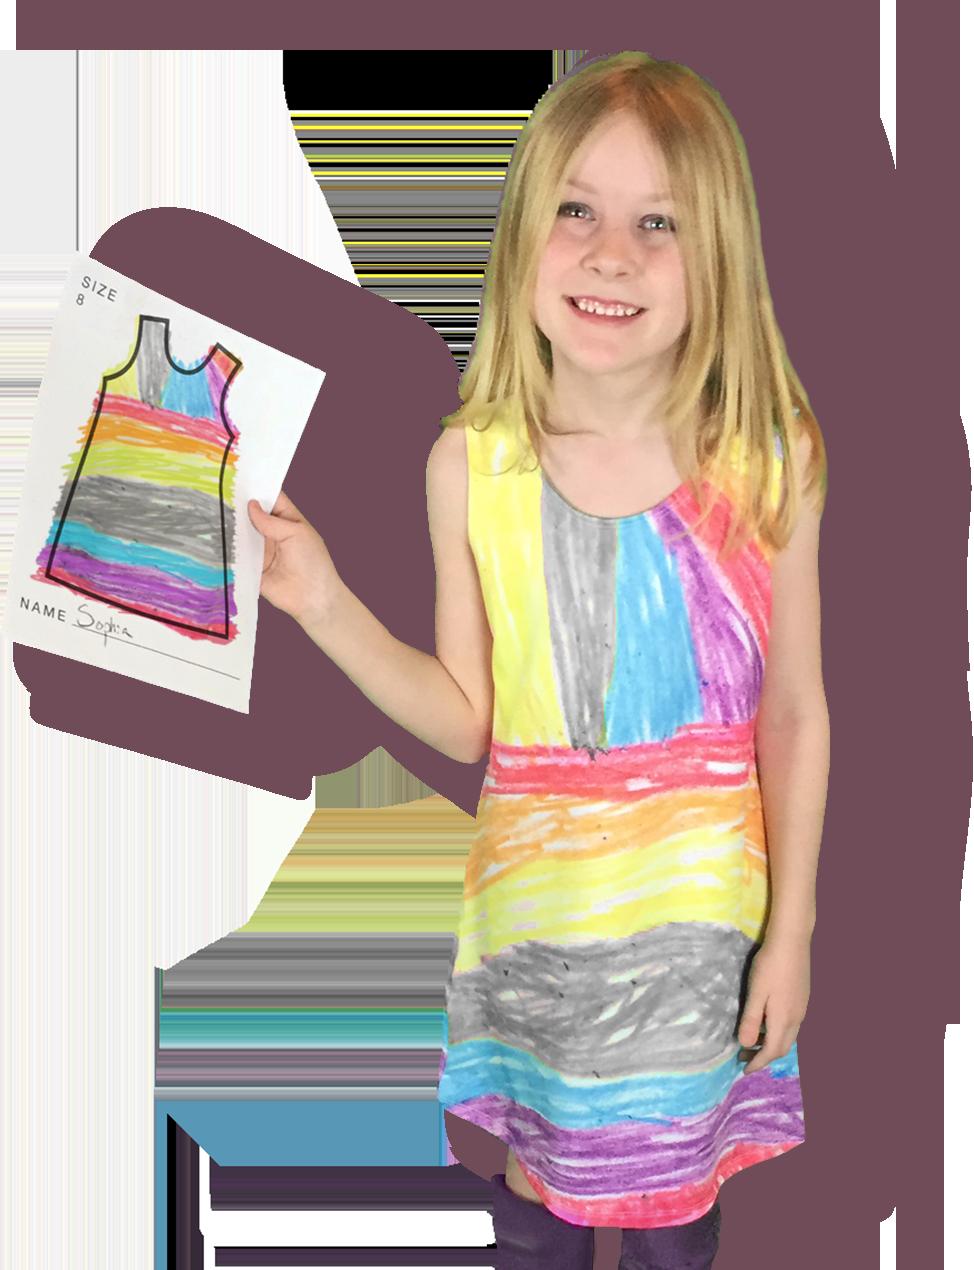 421be9c59 Wear your Imagination! Kids design their dresses hands-on. Parents ...